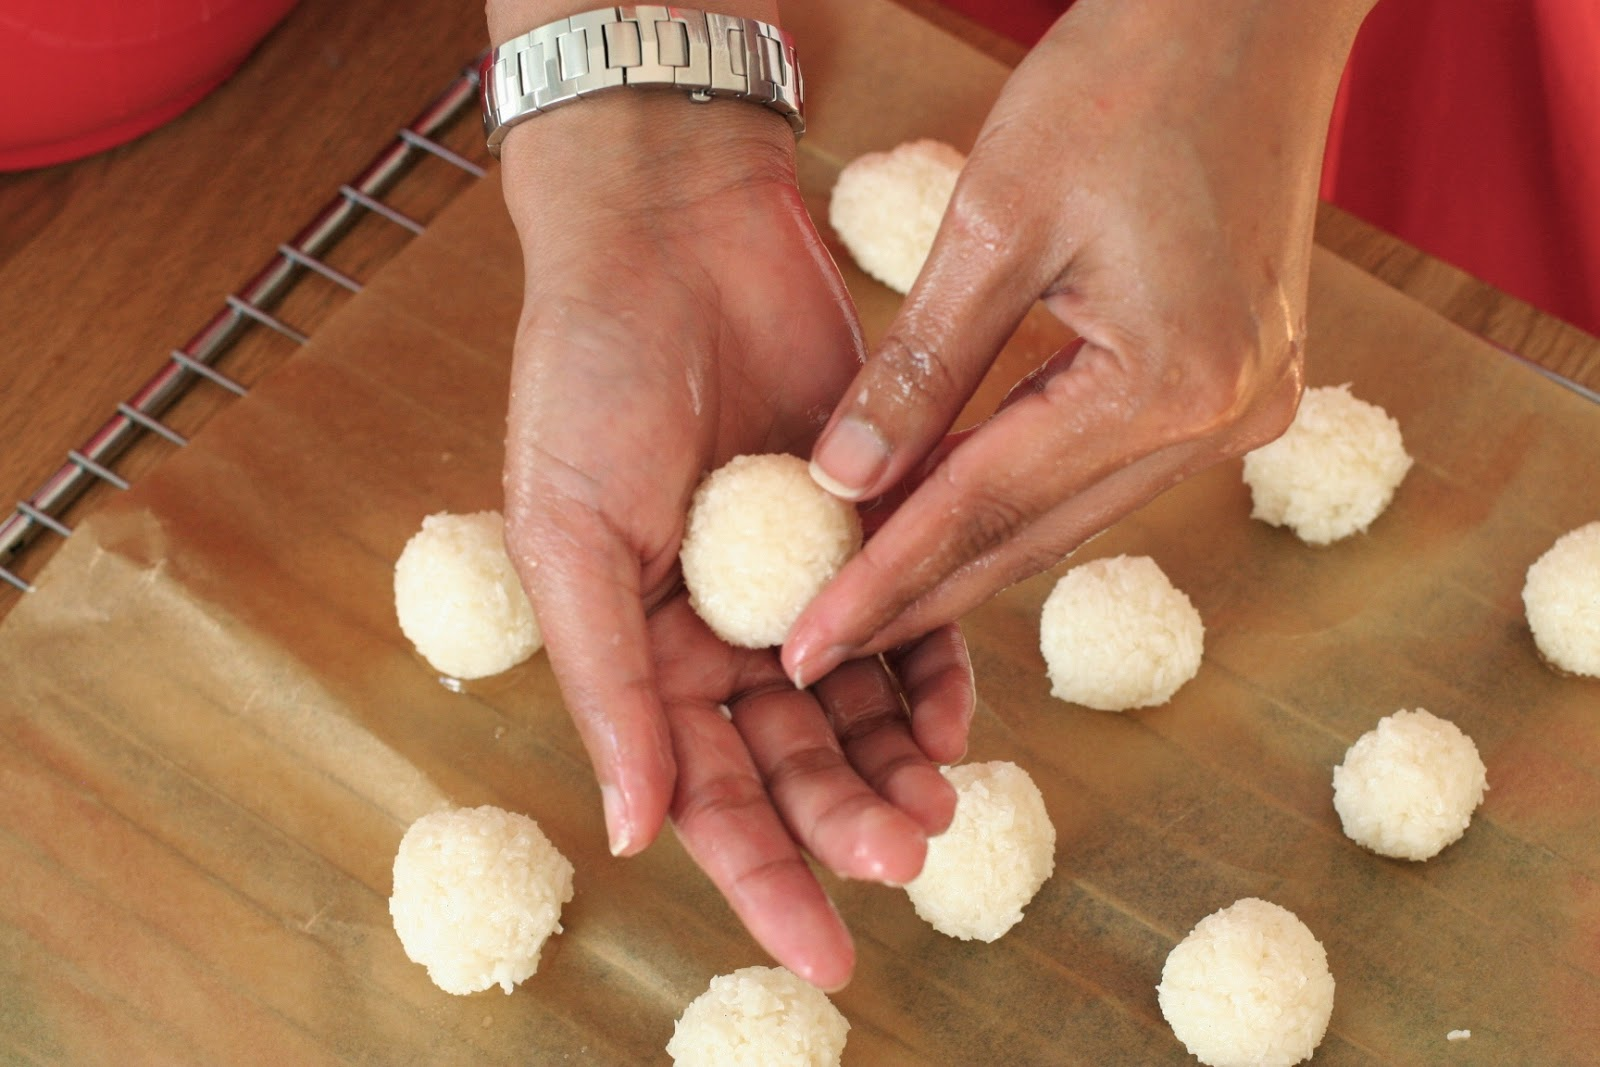 veganbollar, raw balls, raw dessert